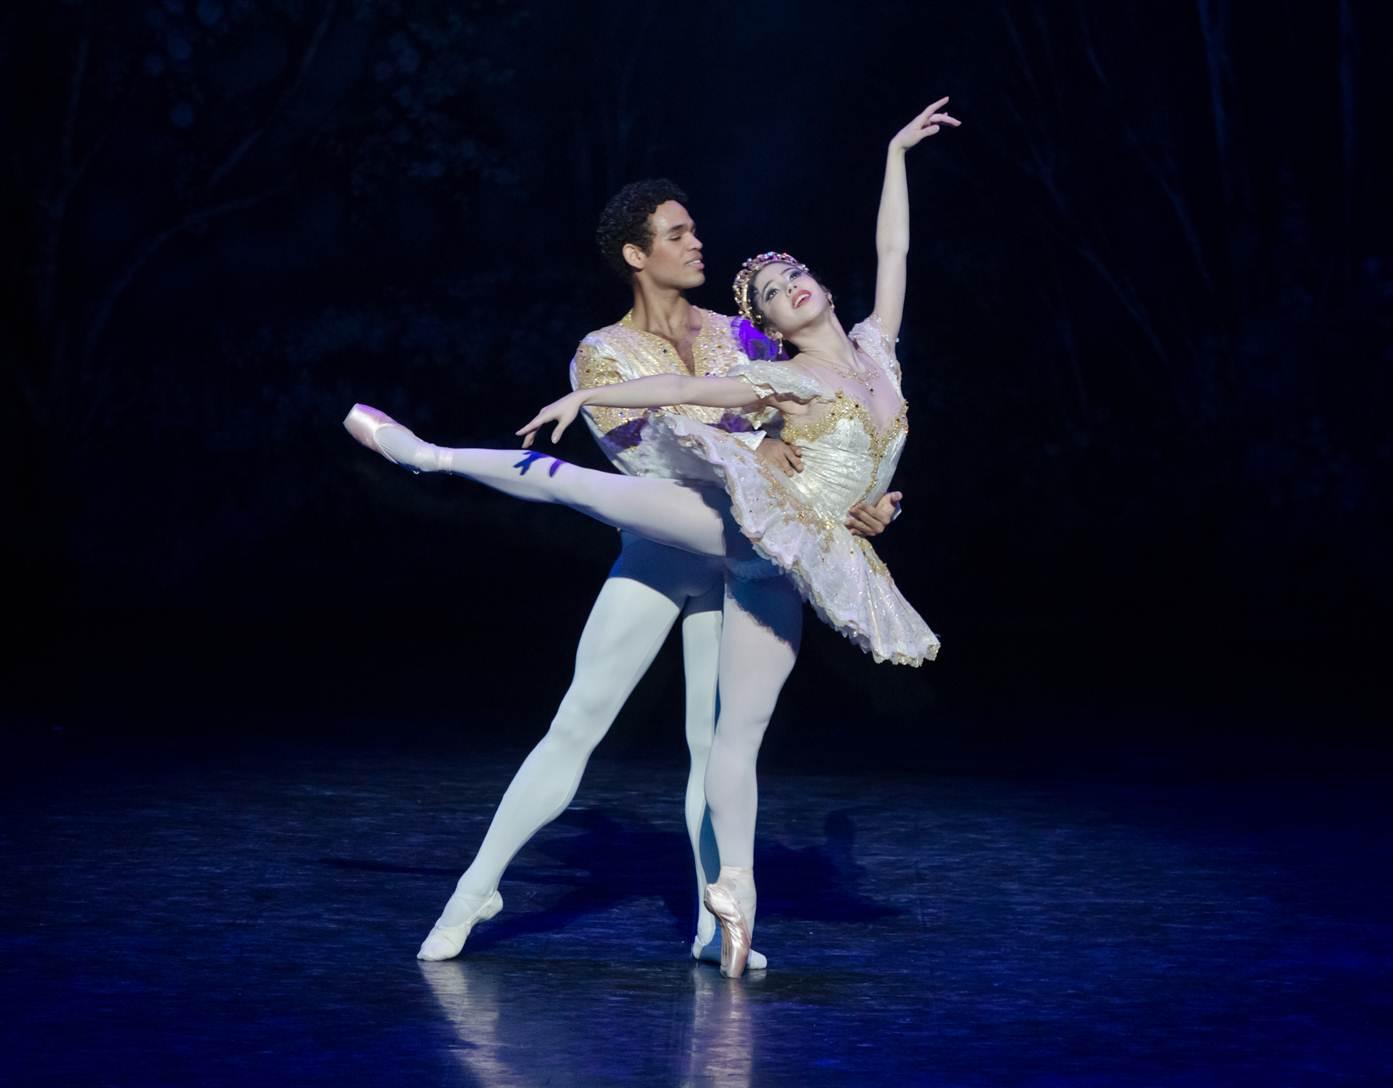 Venus Villa and Yonah Acosta ballet dancers